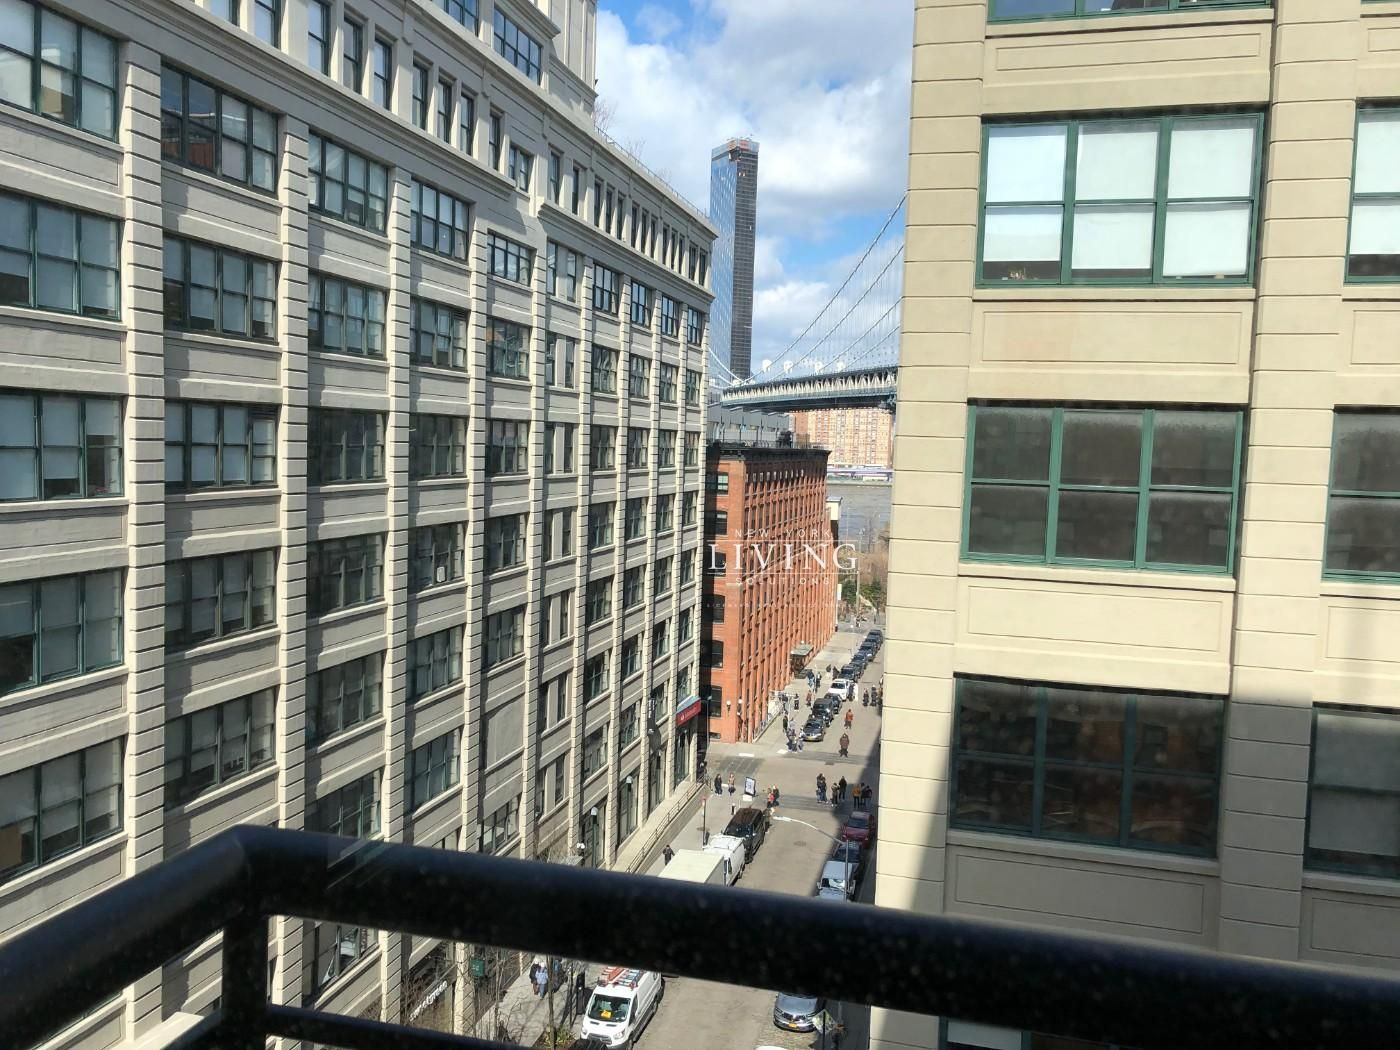 Brooklyn Apartments Dumbo 2 Bedroom Apartment For Rent Brooklyn Apartments For Rent Apartments For Rent Brooklyn Apartment